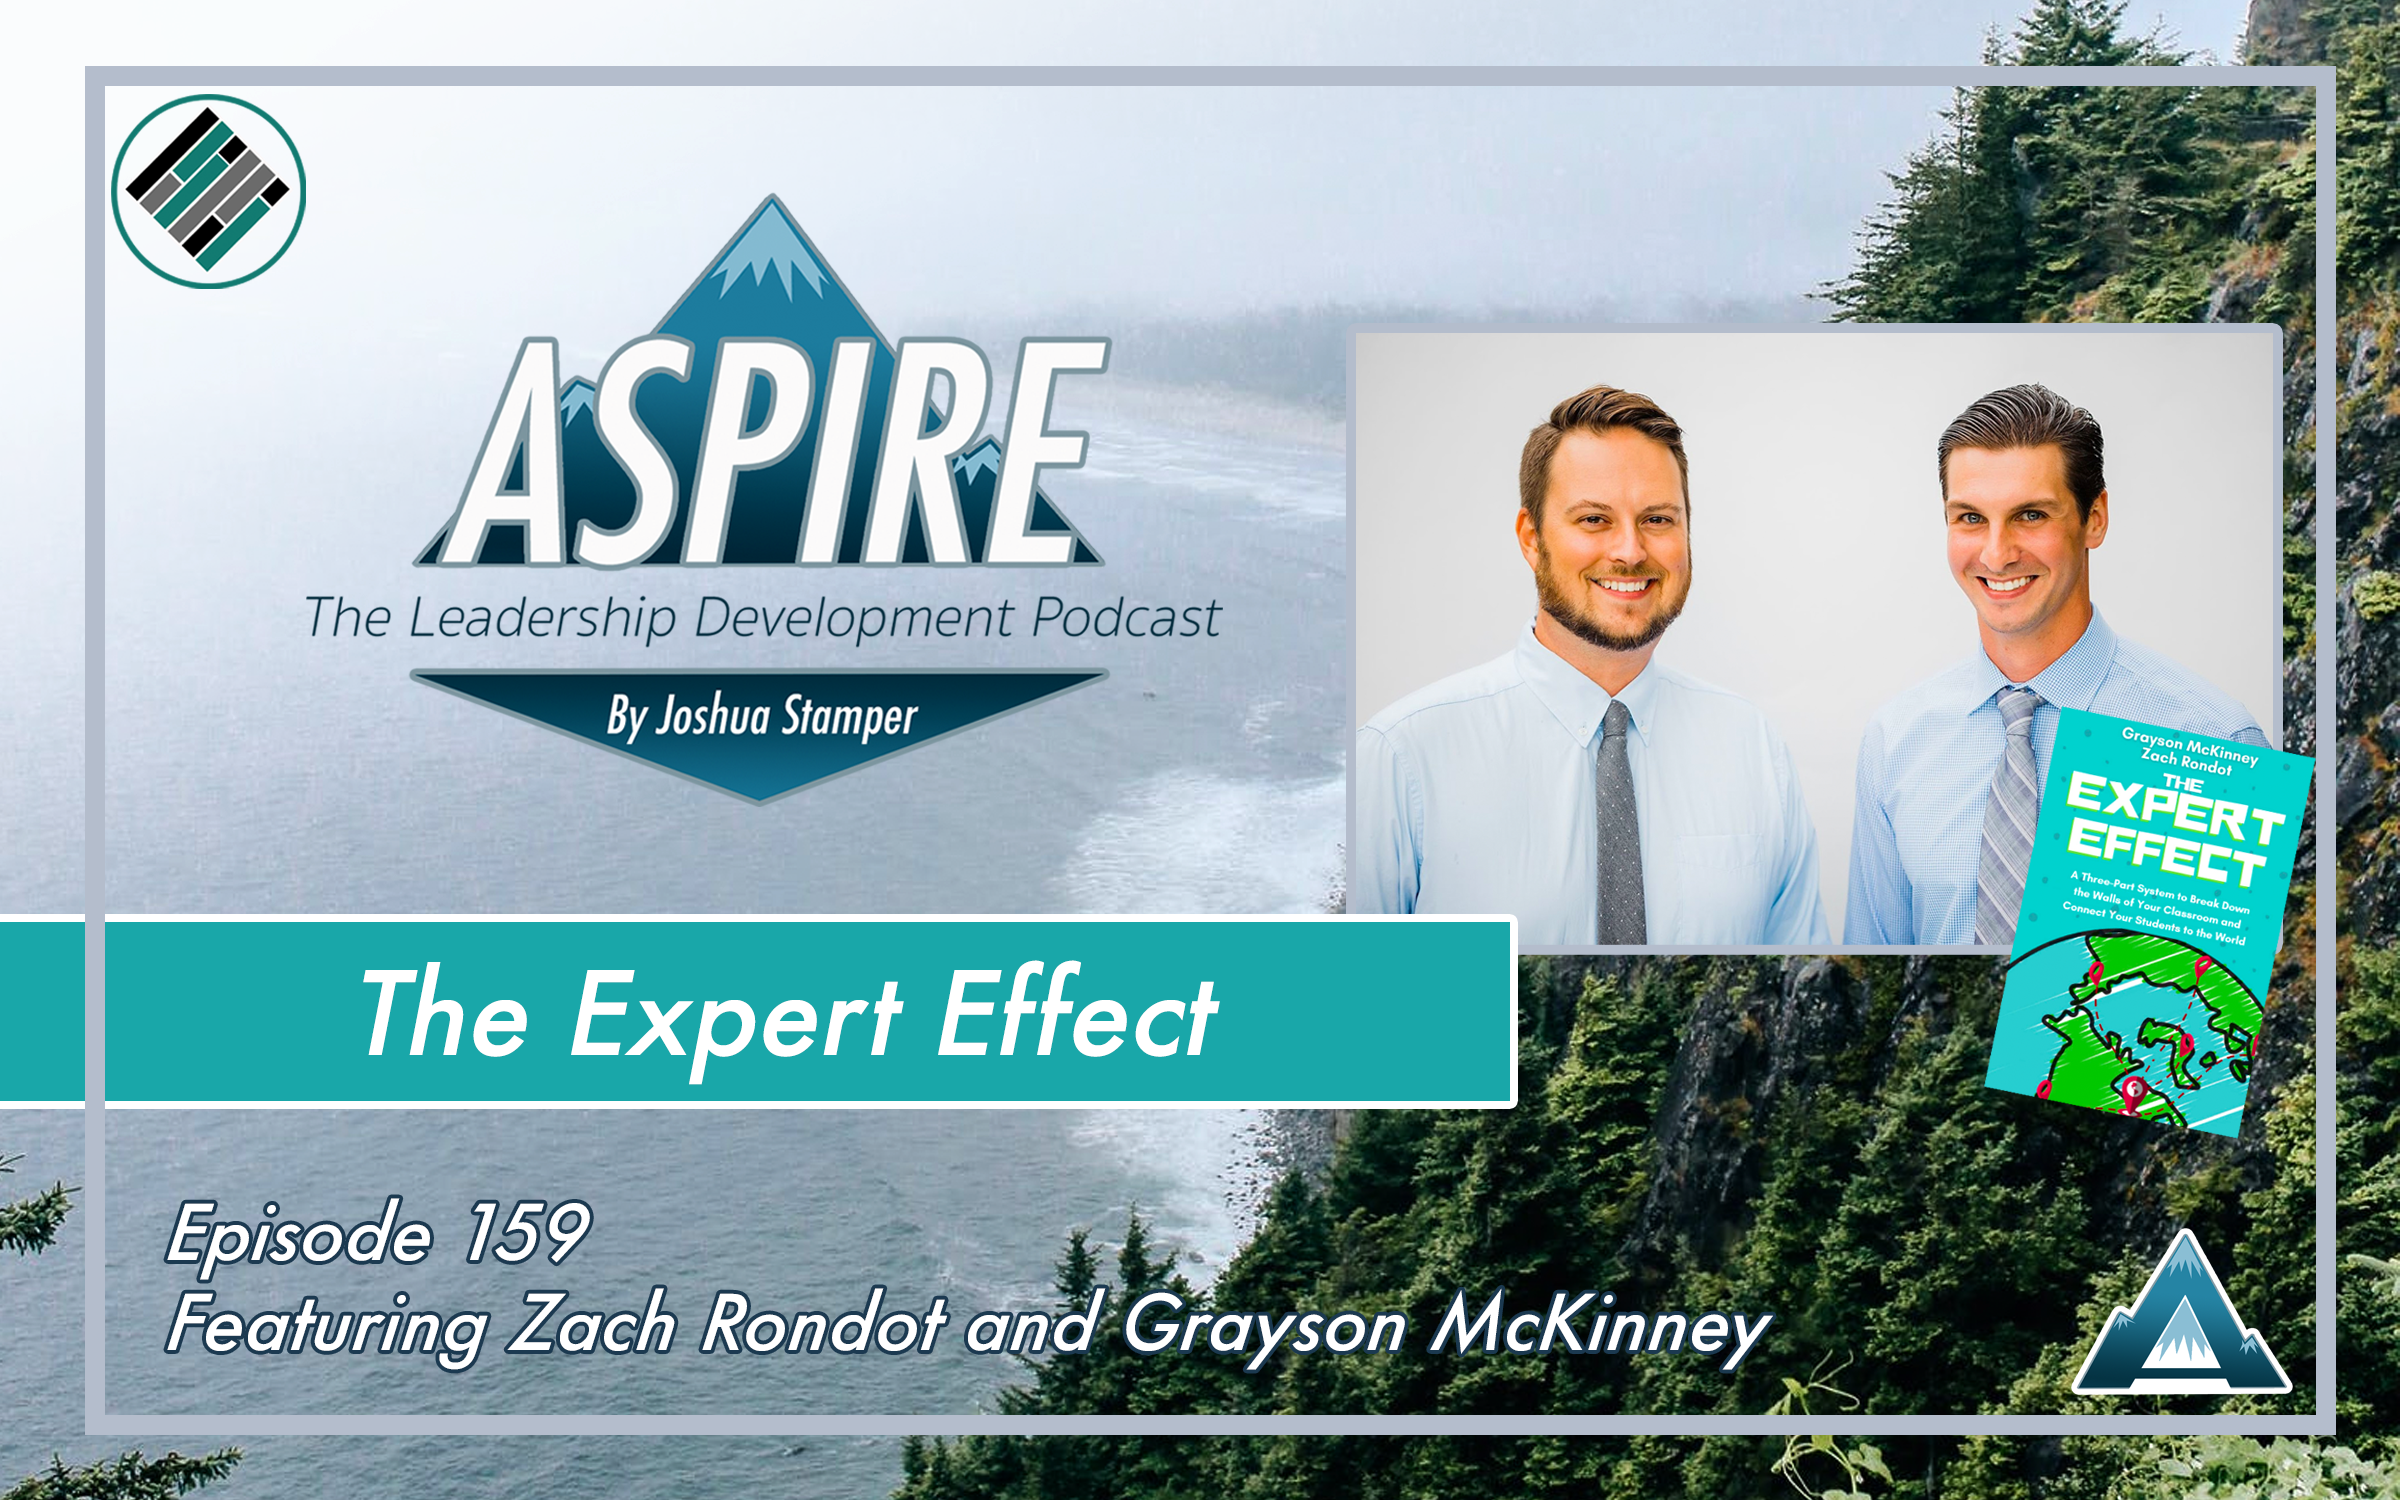 Joshua Stamper, Aspire: The Leadership Development Podcast, #AspireLead, Zach Rondot, Grayson McKinney, The Expert Effect, Teach Better